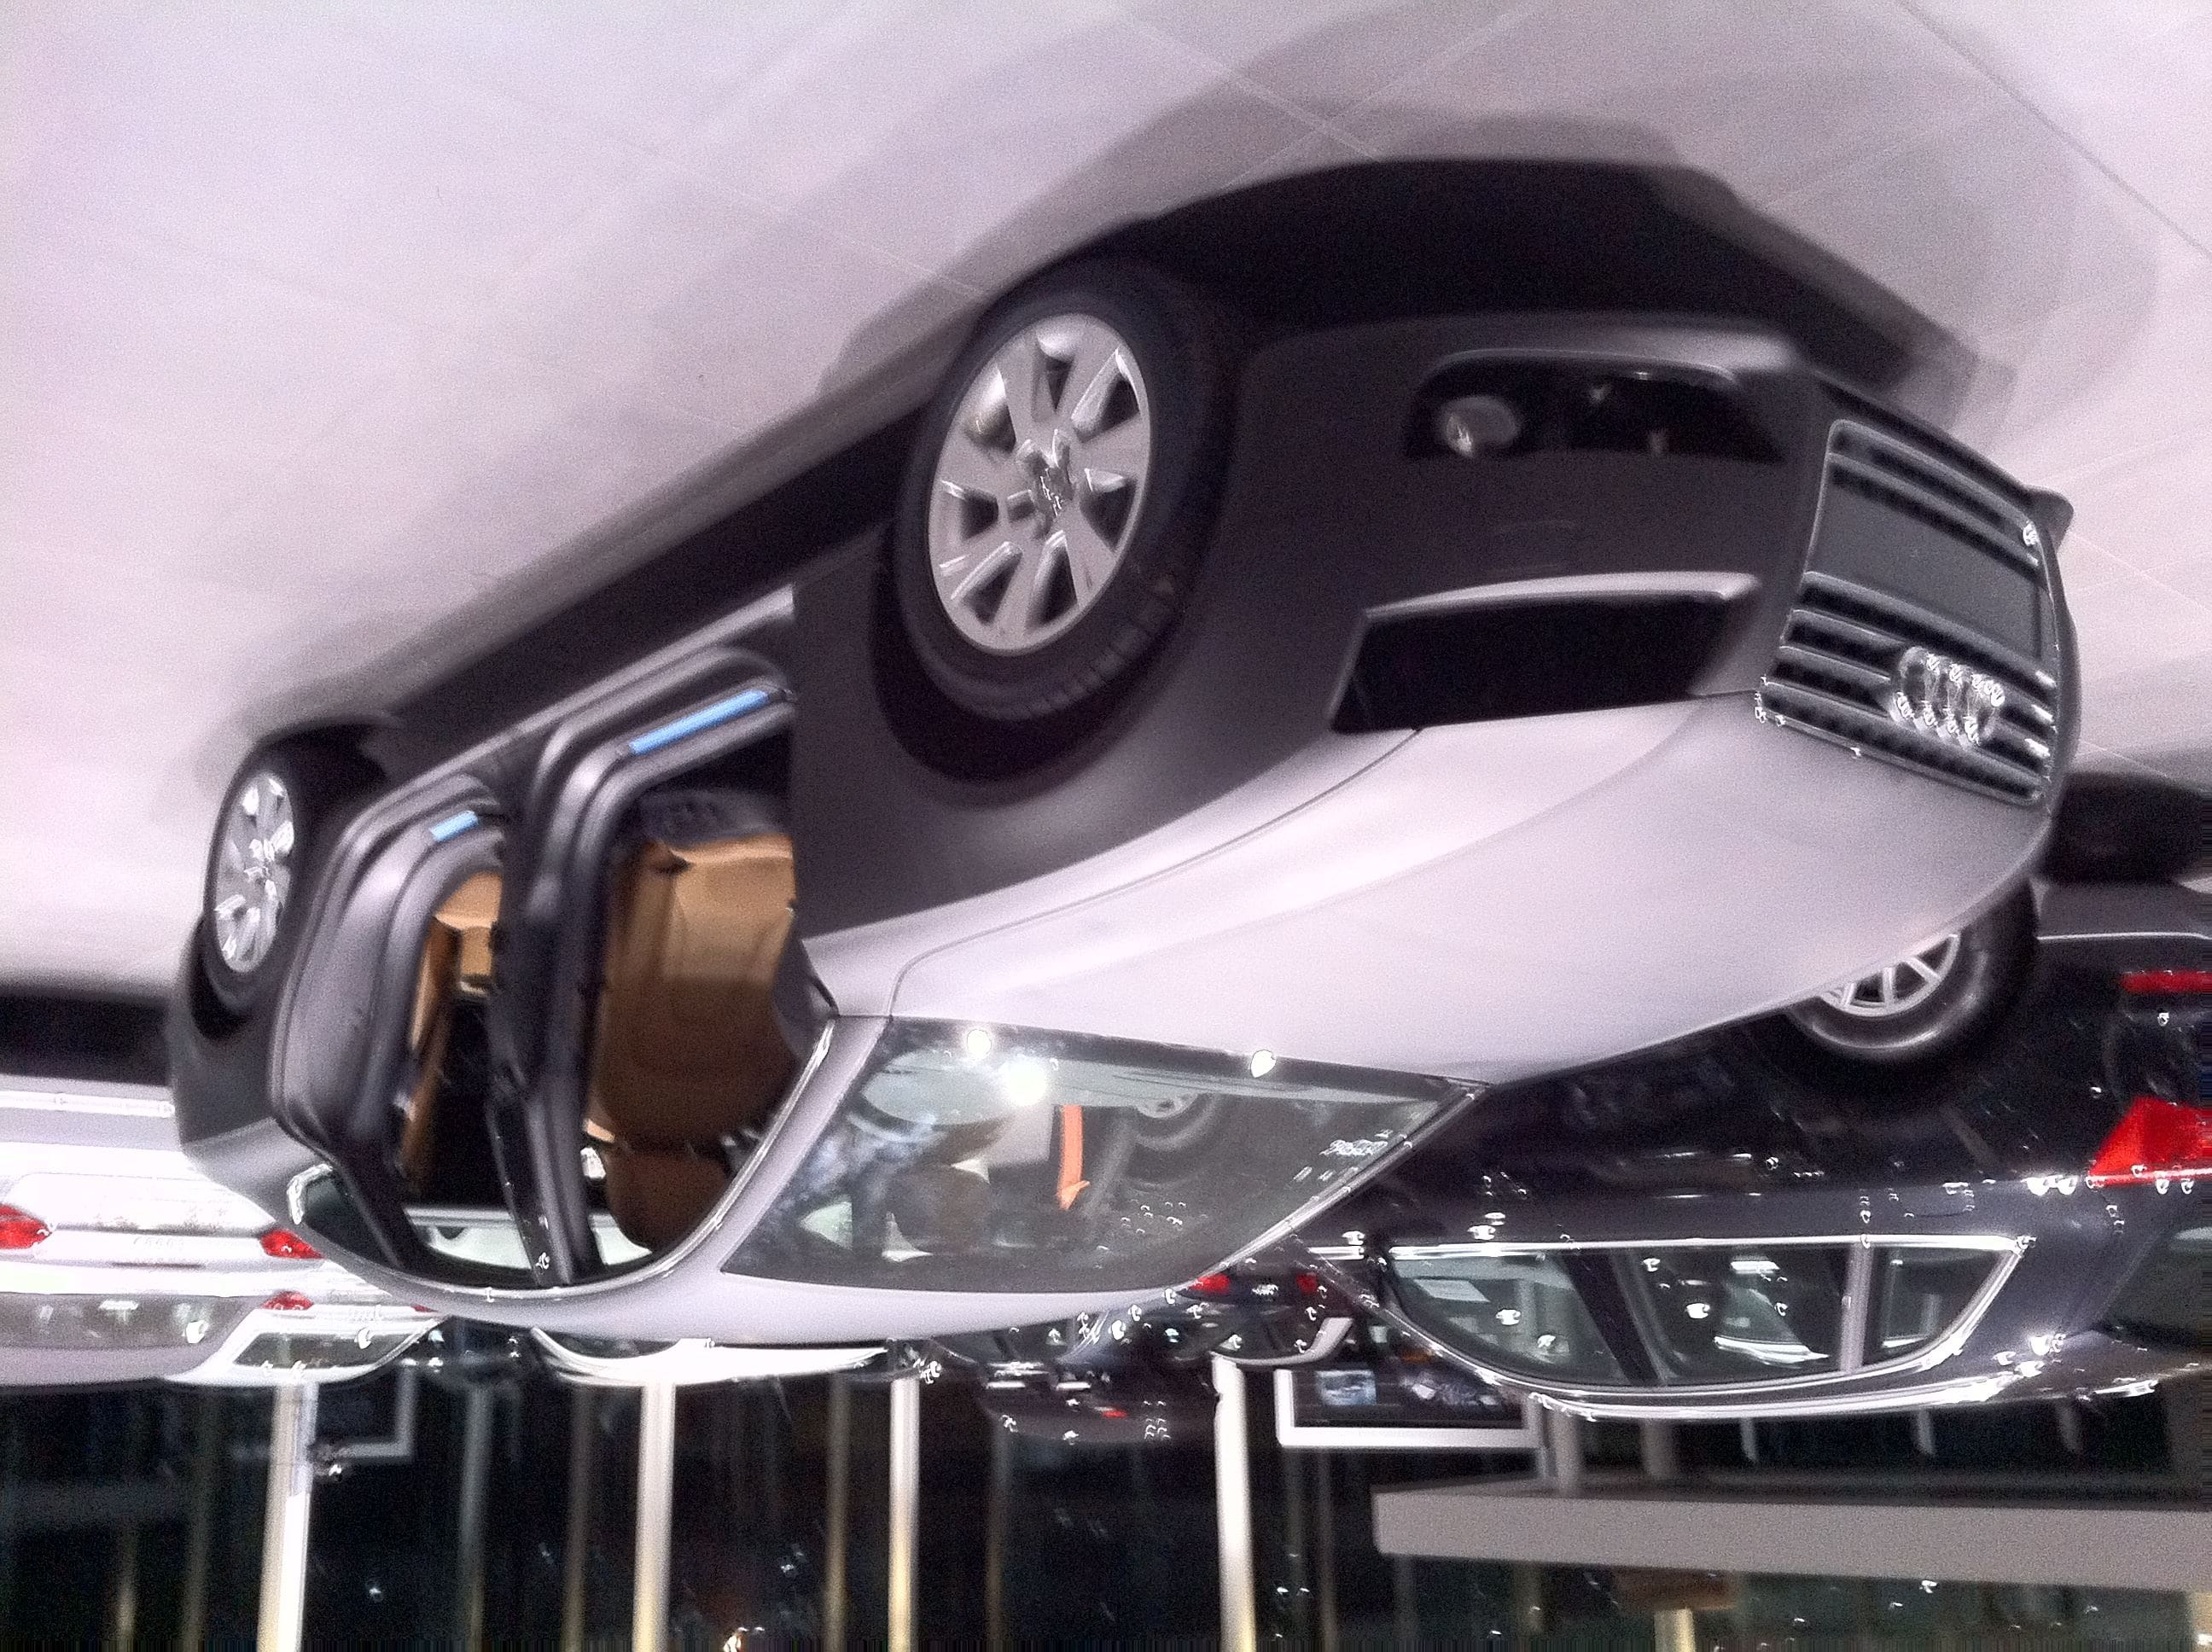 Audi A5 Sportback met Mat Grijze Wrap, Carwrapping door Wrapmyride.nu Foto-nr:4785, ©2021